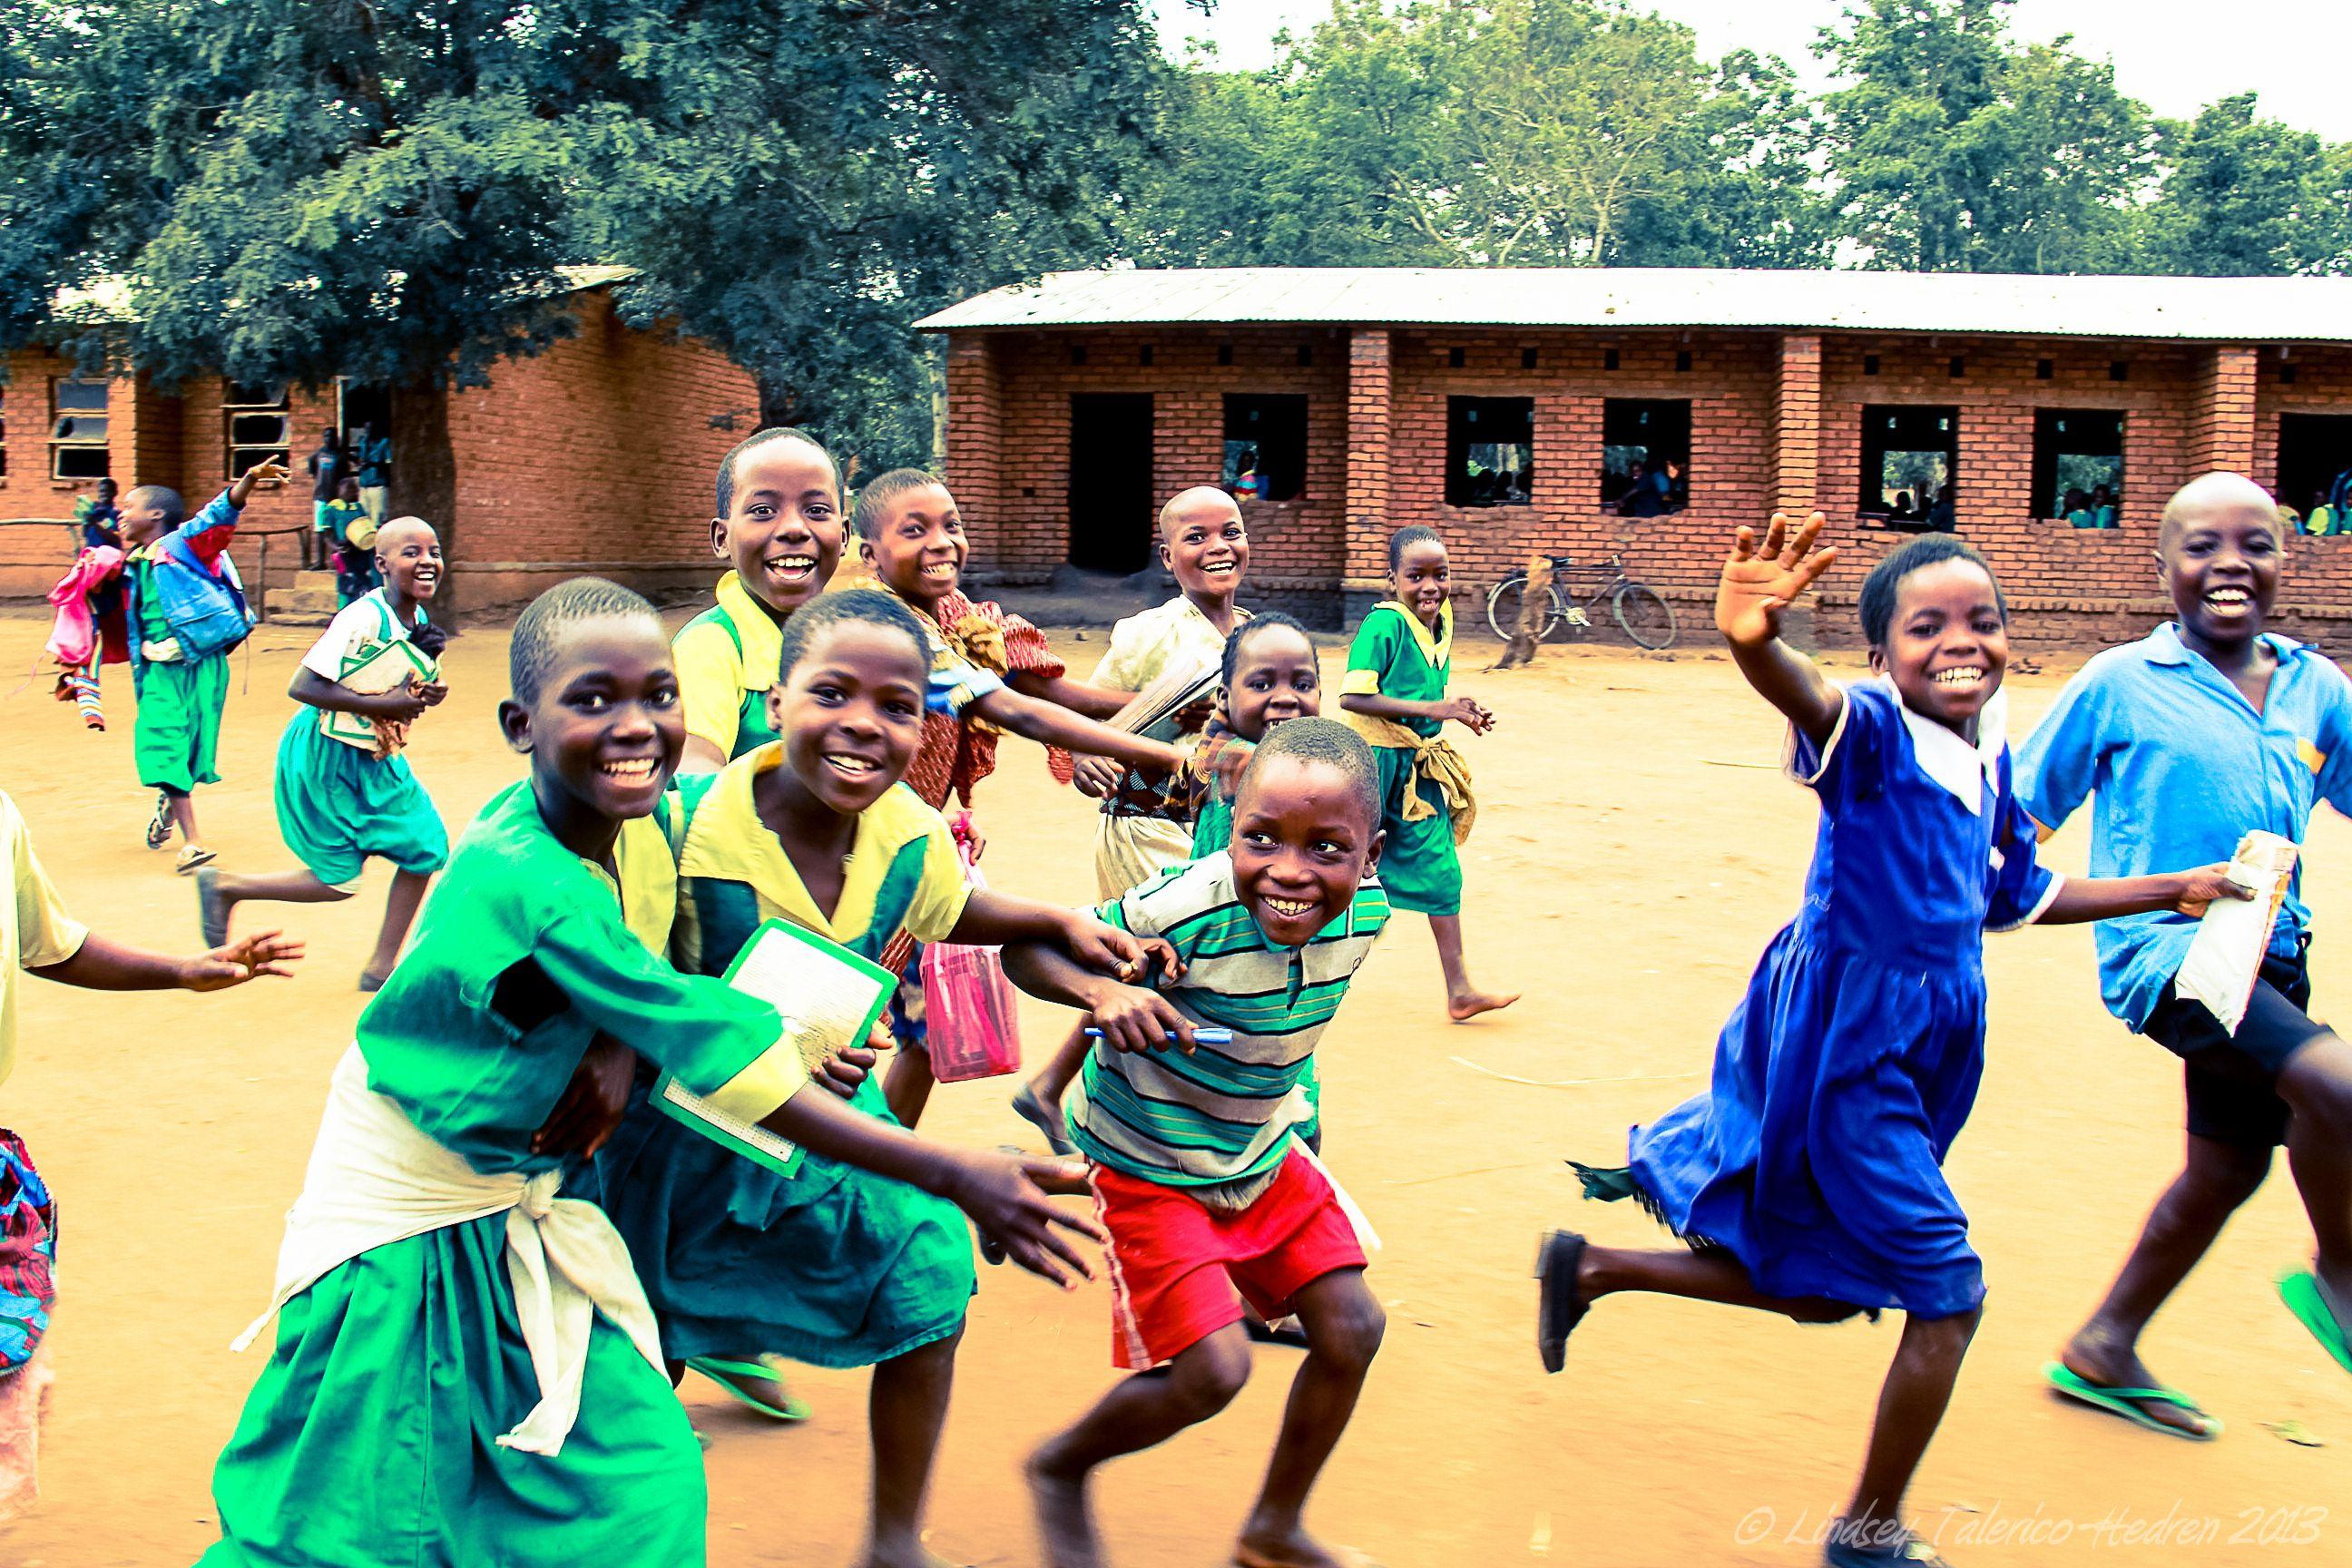 Scenes from Malawi.  (c) Lindsey Talerico-Hedren